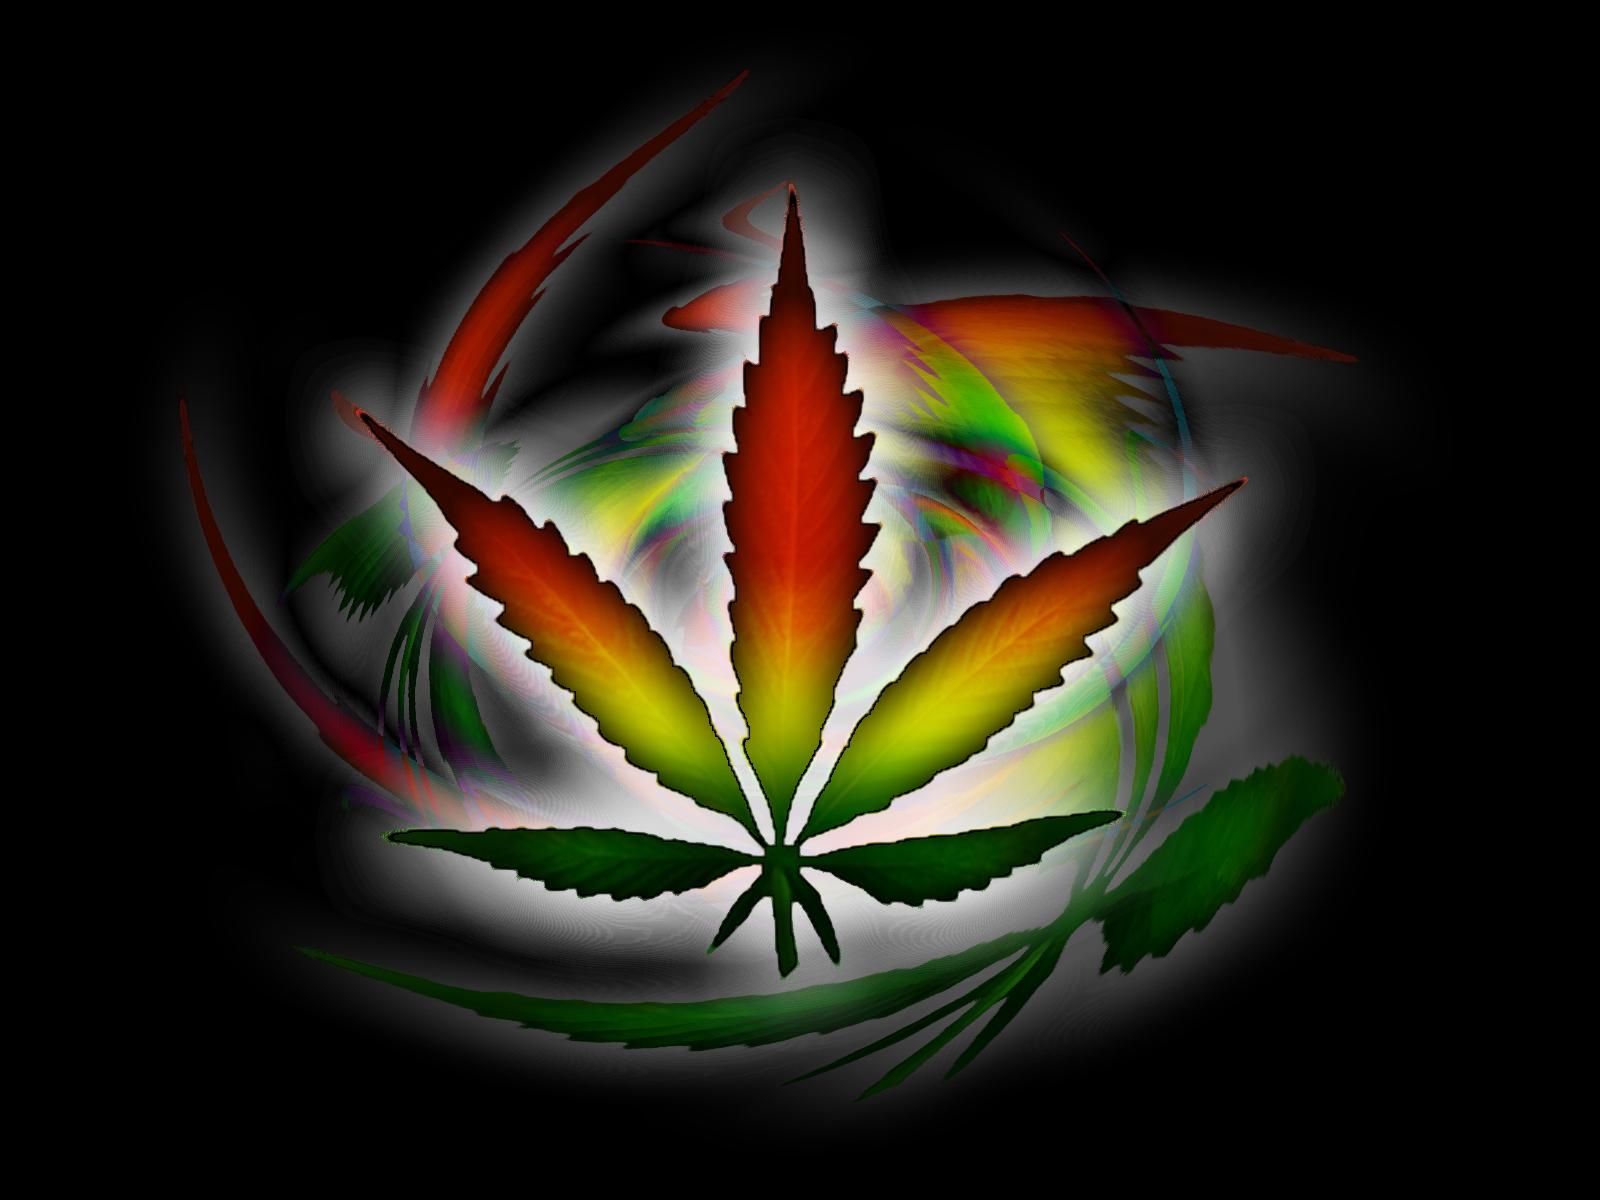 Awesome stoner wallpaper wallpapersafari - Free marijuana desktop backgrounds ...